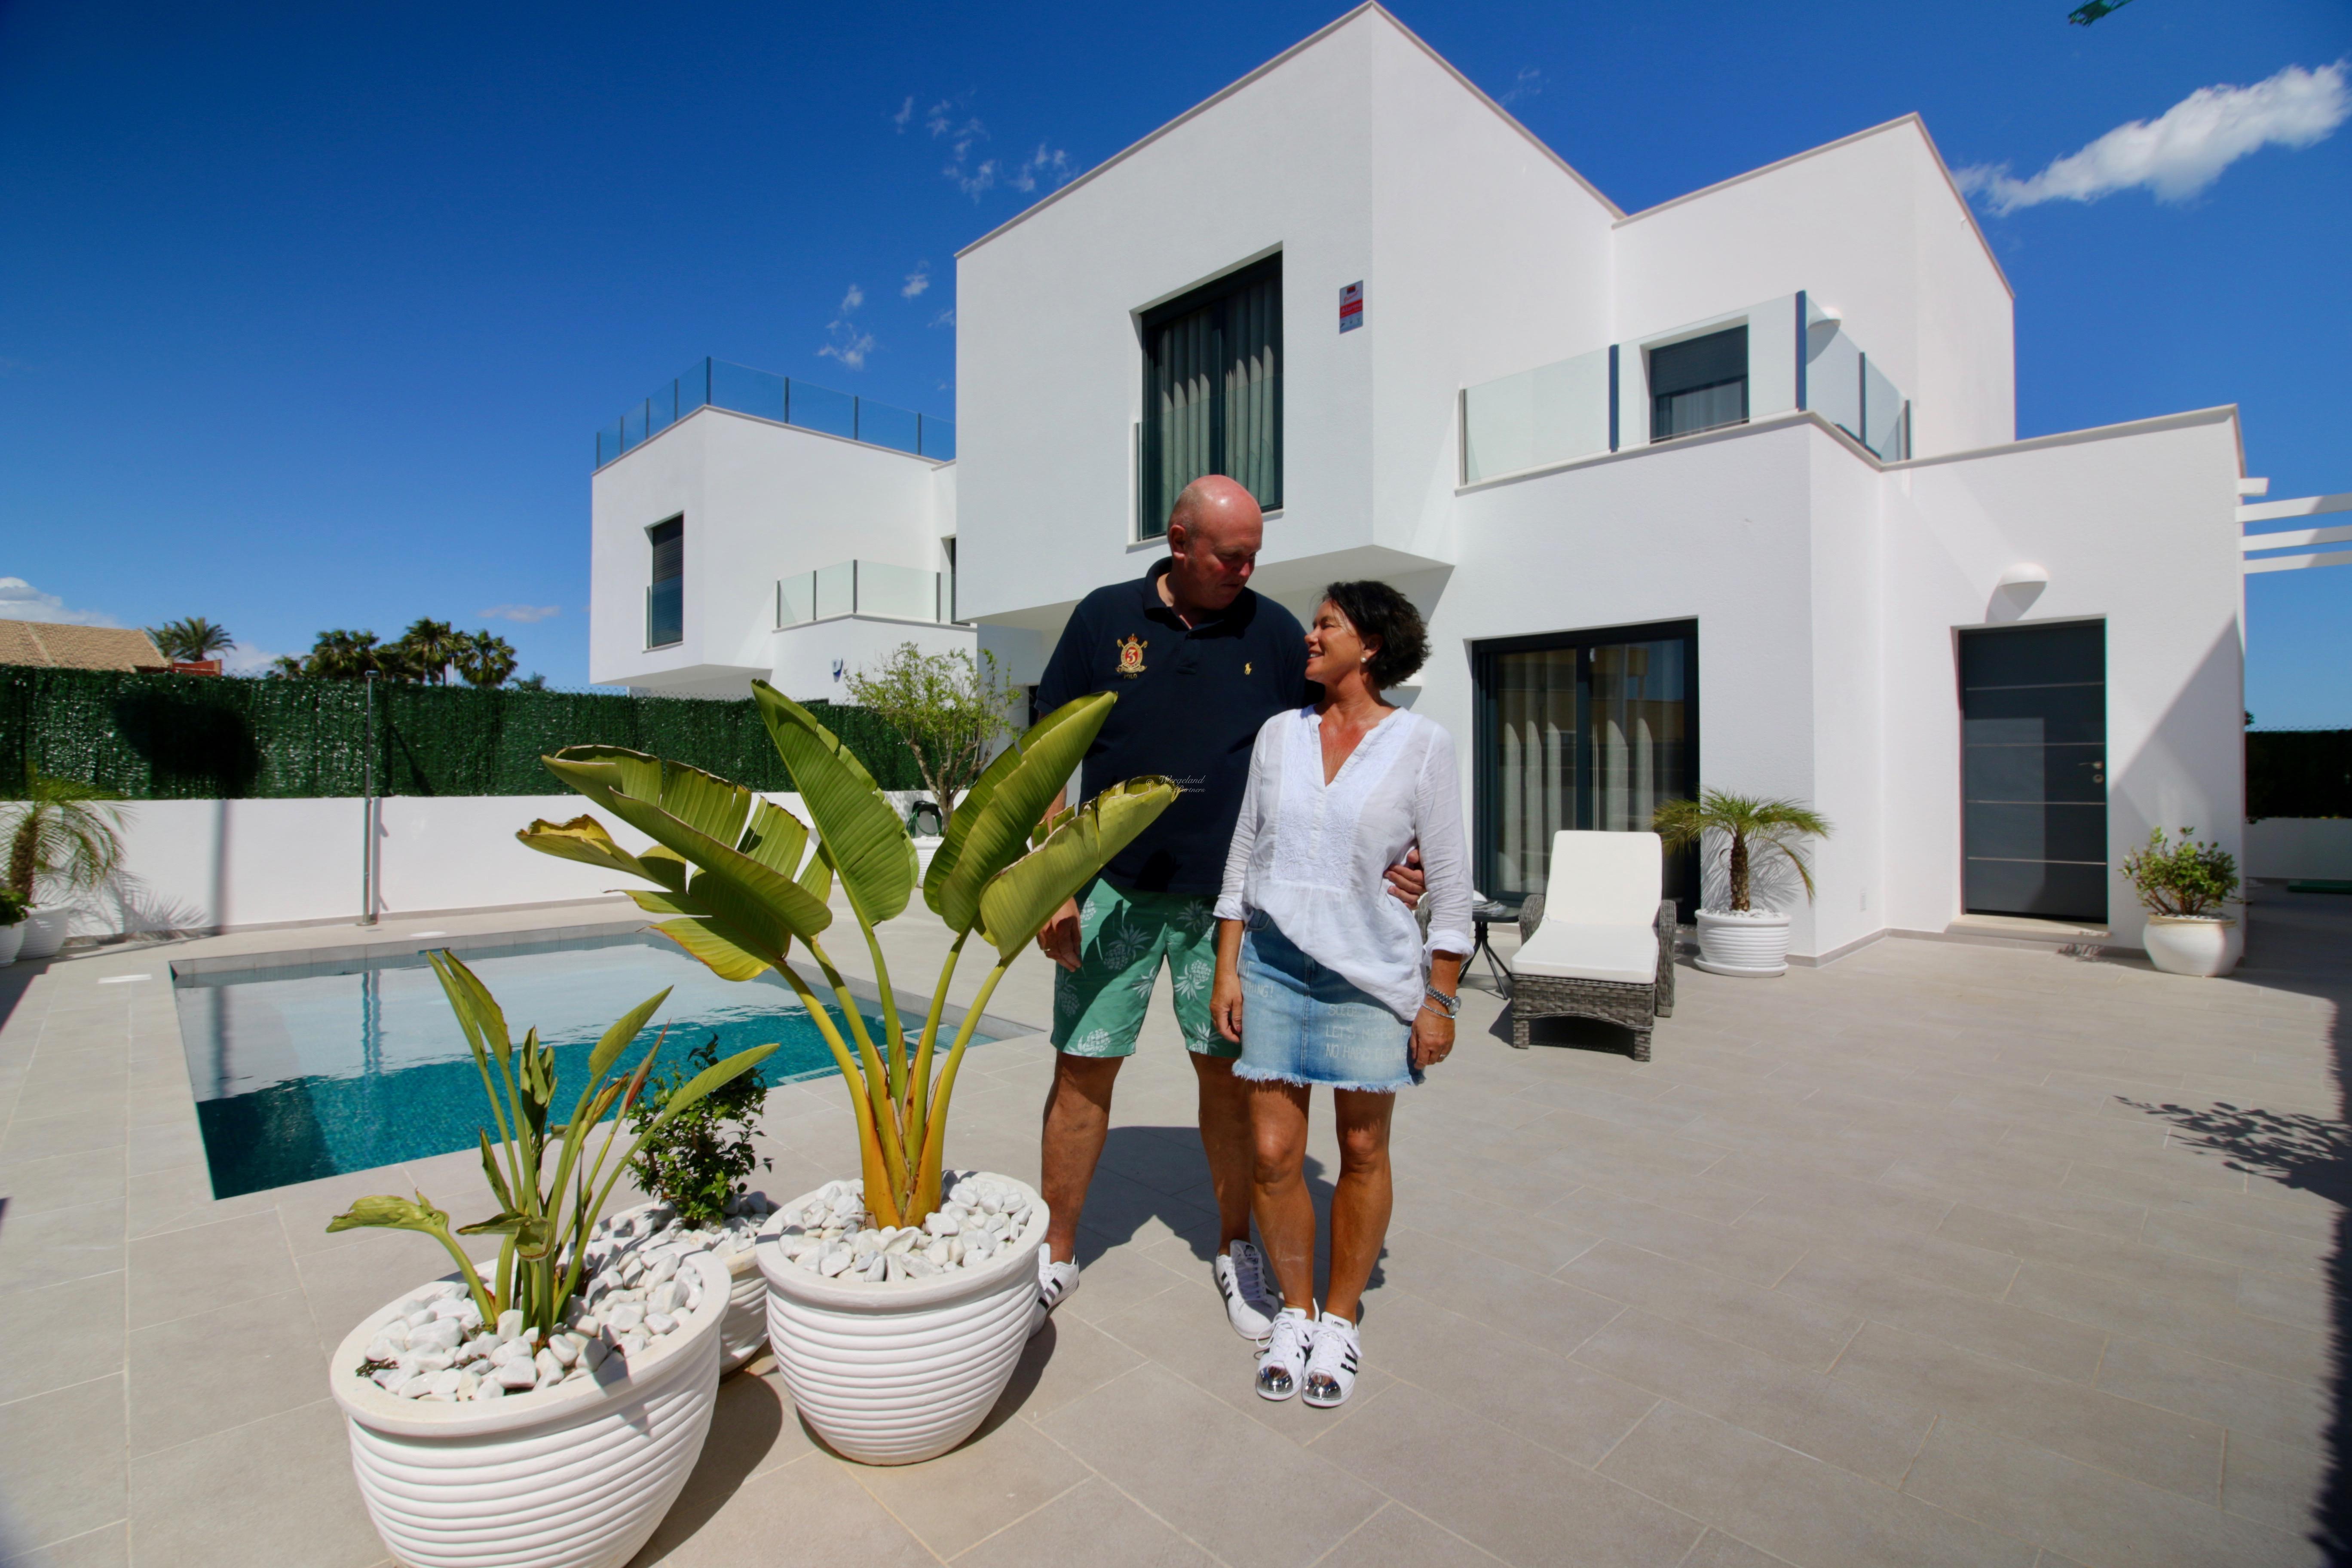 Meglerens Valg: 4-roms moderne og lys enebolig med privat basseng og takterrasse- gangavstand til Middelhavets strender [EPVW]